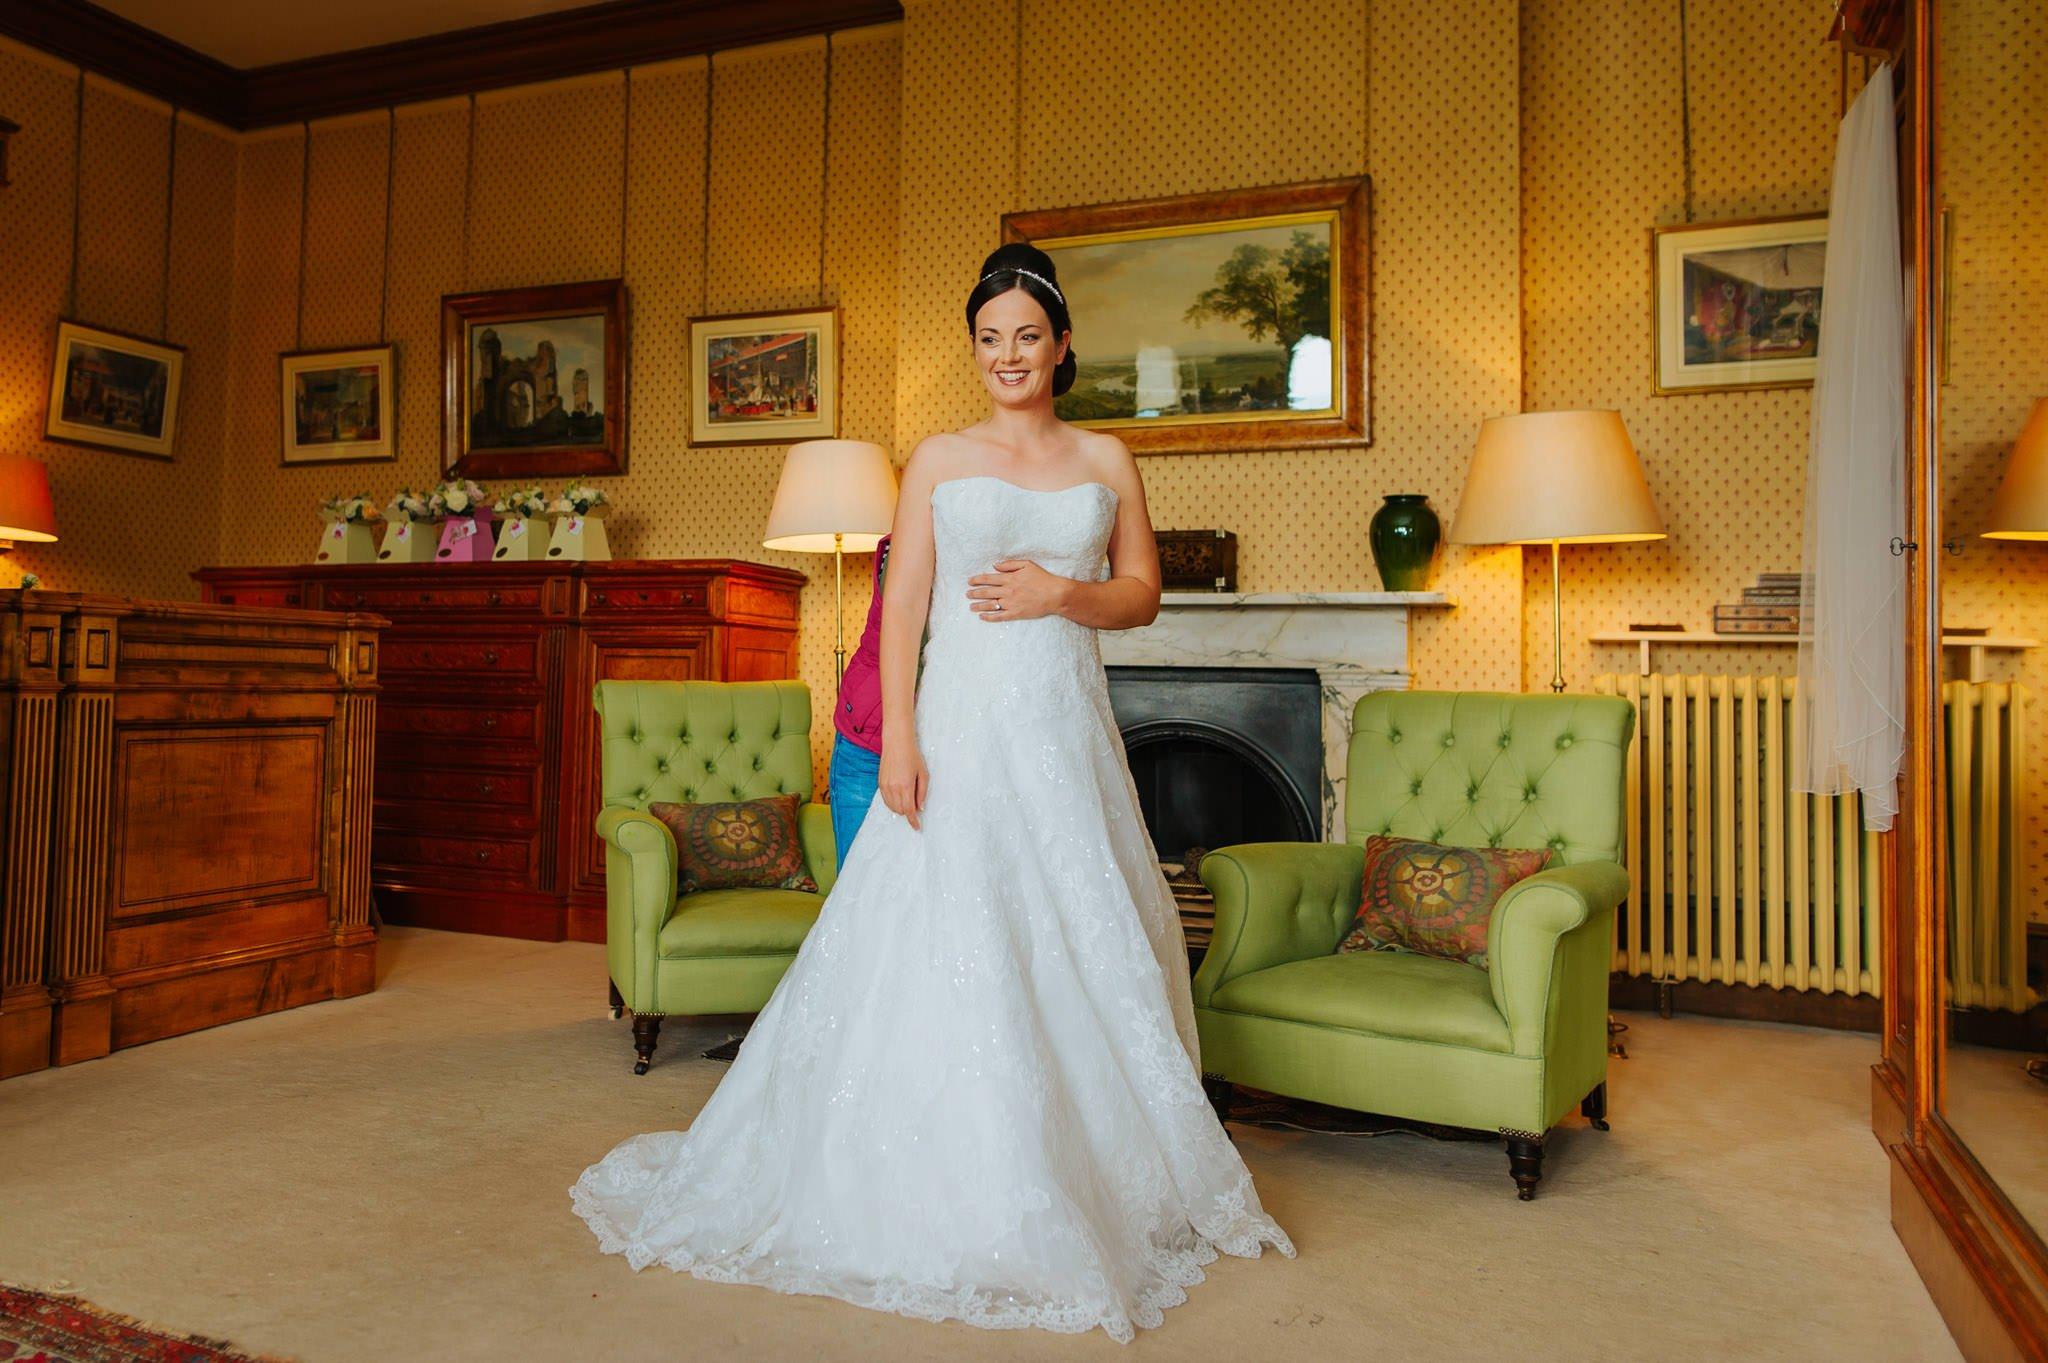 Eastnor Castle wedding photographer Herefordshire, West Midlands - Sarah + Dean 2